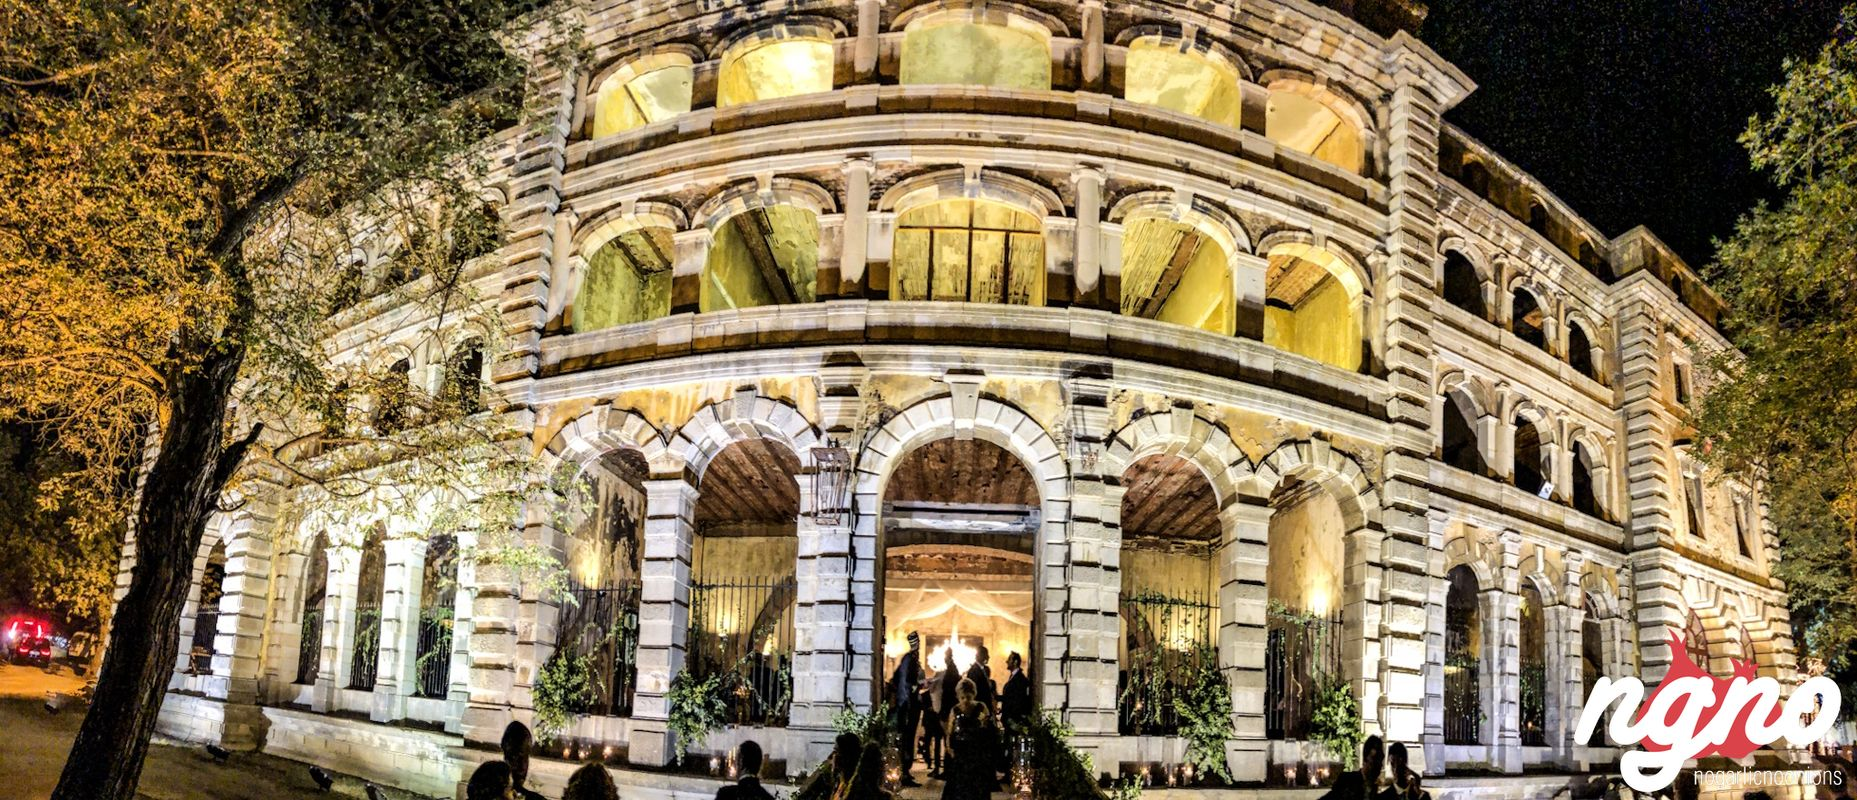 grand-sofar-hotel-nogarlicnoonions-512018-09-06-03-44-58